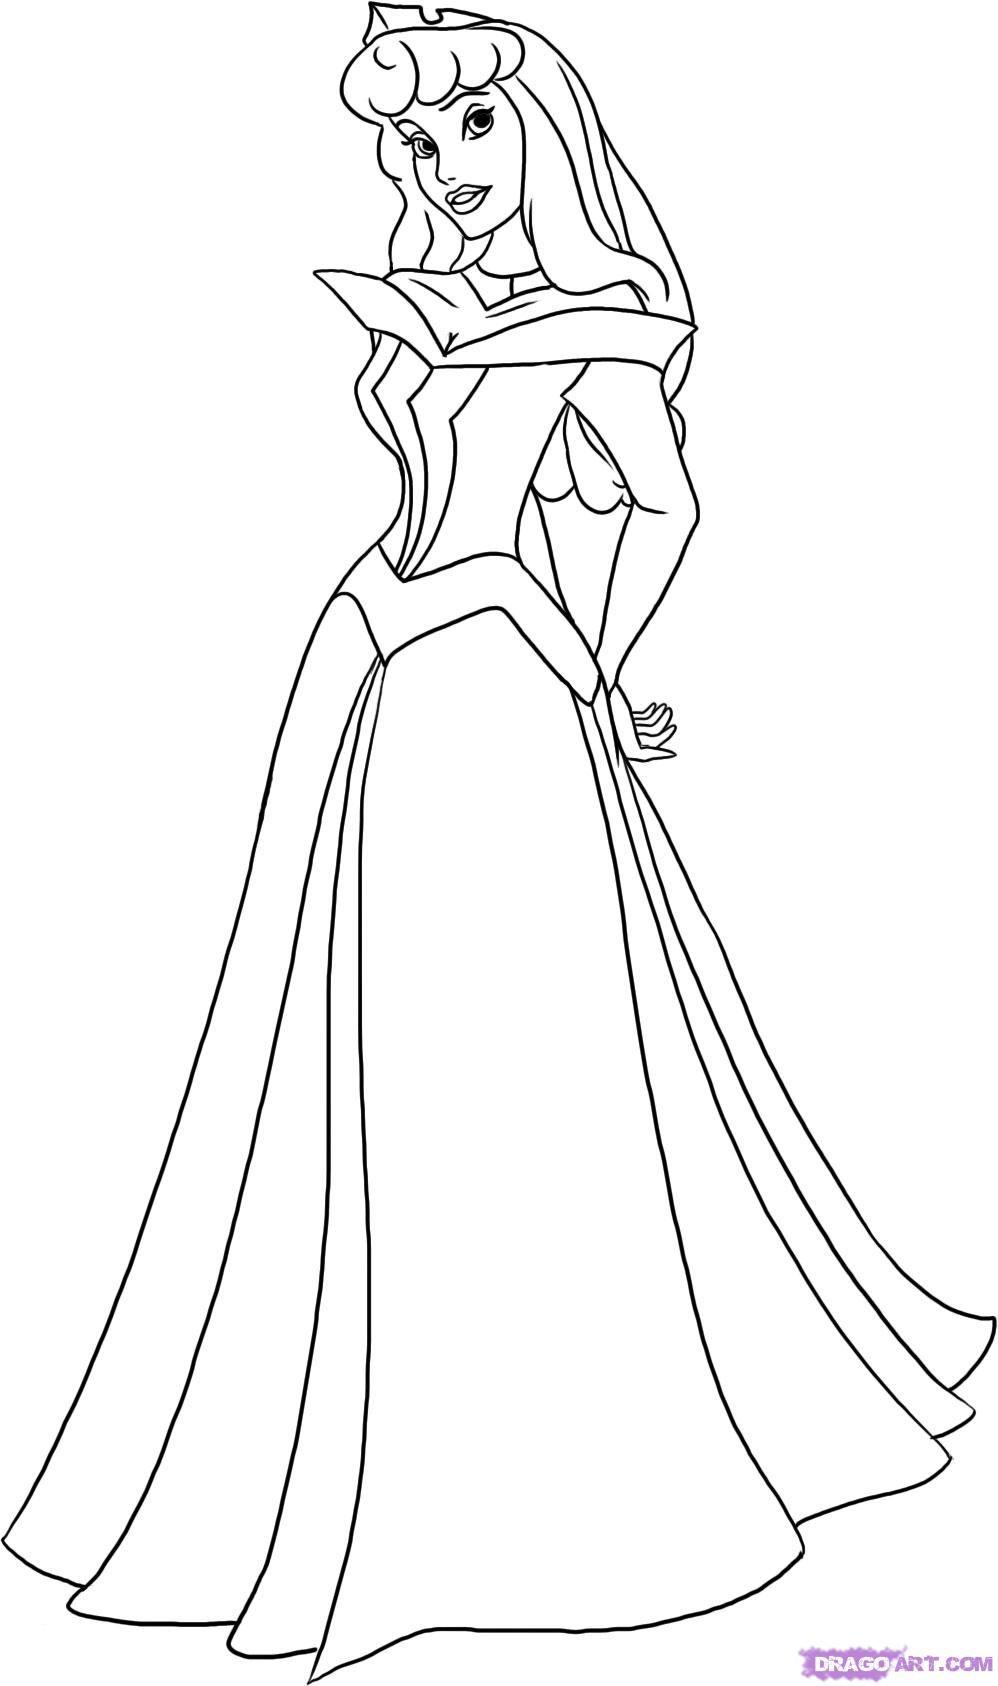 998x1686 How To Draw Sleeping Beauty, Princess Aurora Step 5 How To Draw